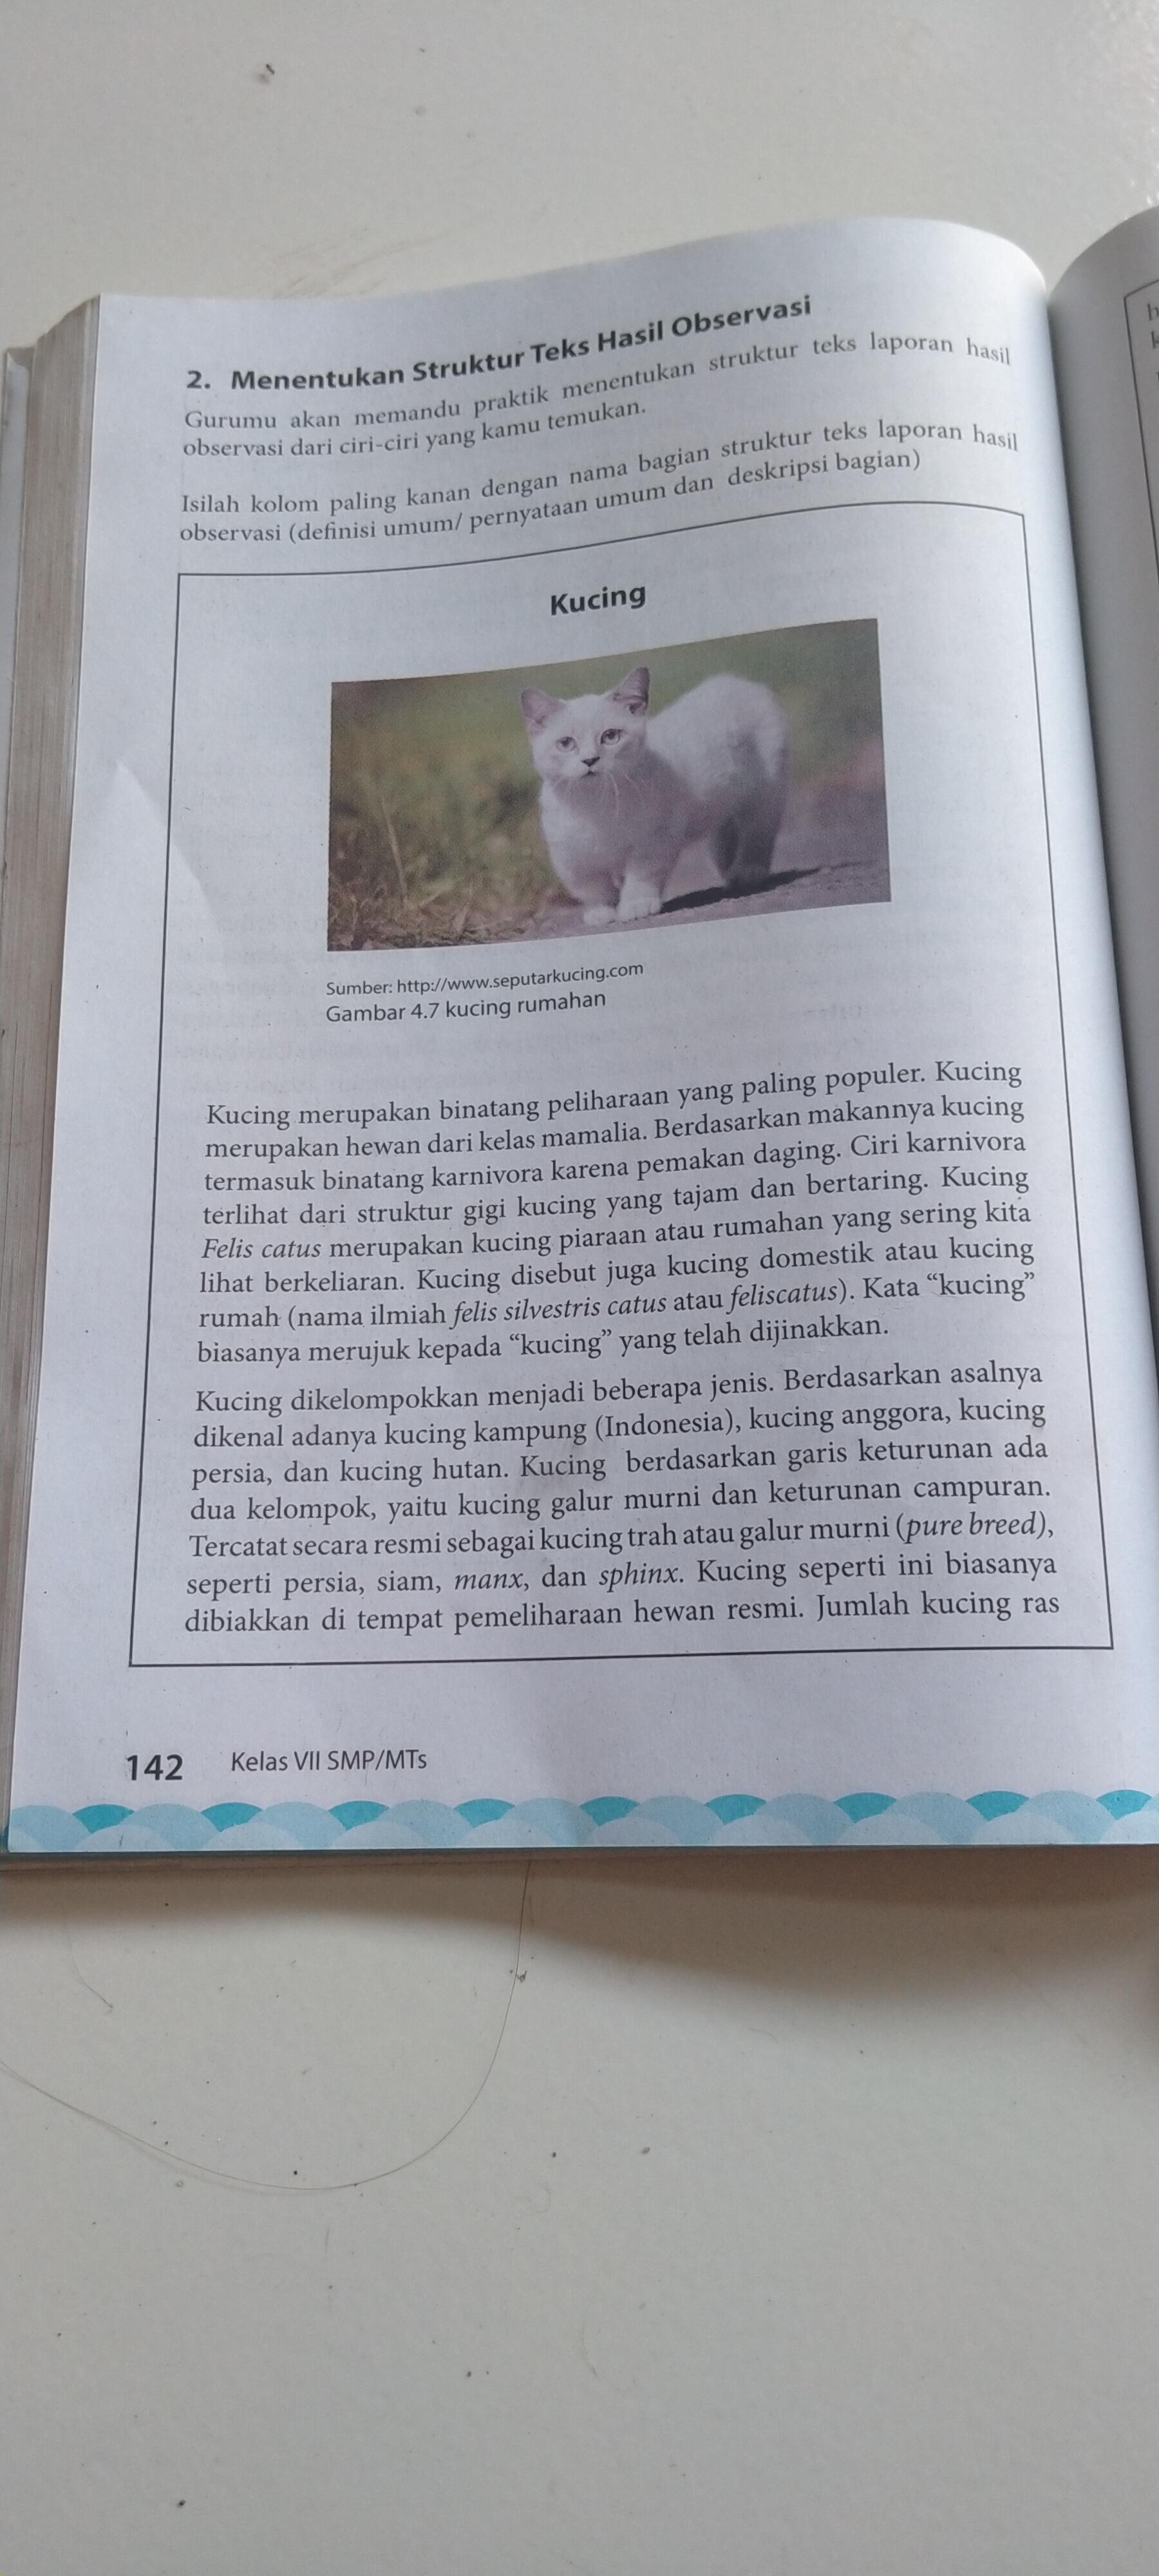 Bacalah Teks Laporan Hasil Observasi Kucing Halaman 142 143 Yang Ada Di Buku Paketmu Bse Brainly Co Id